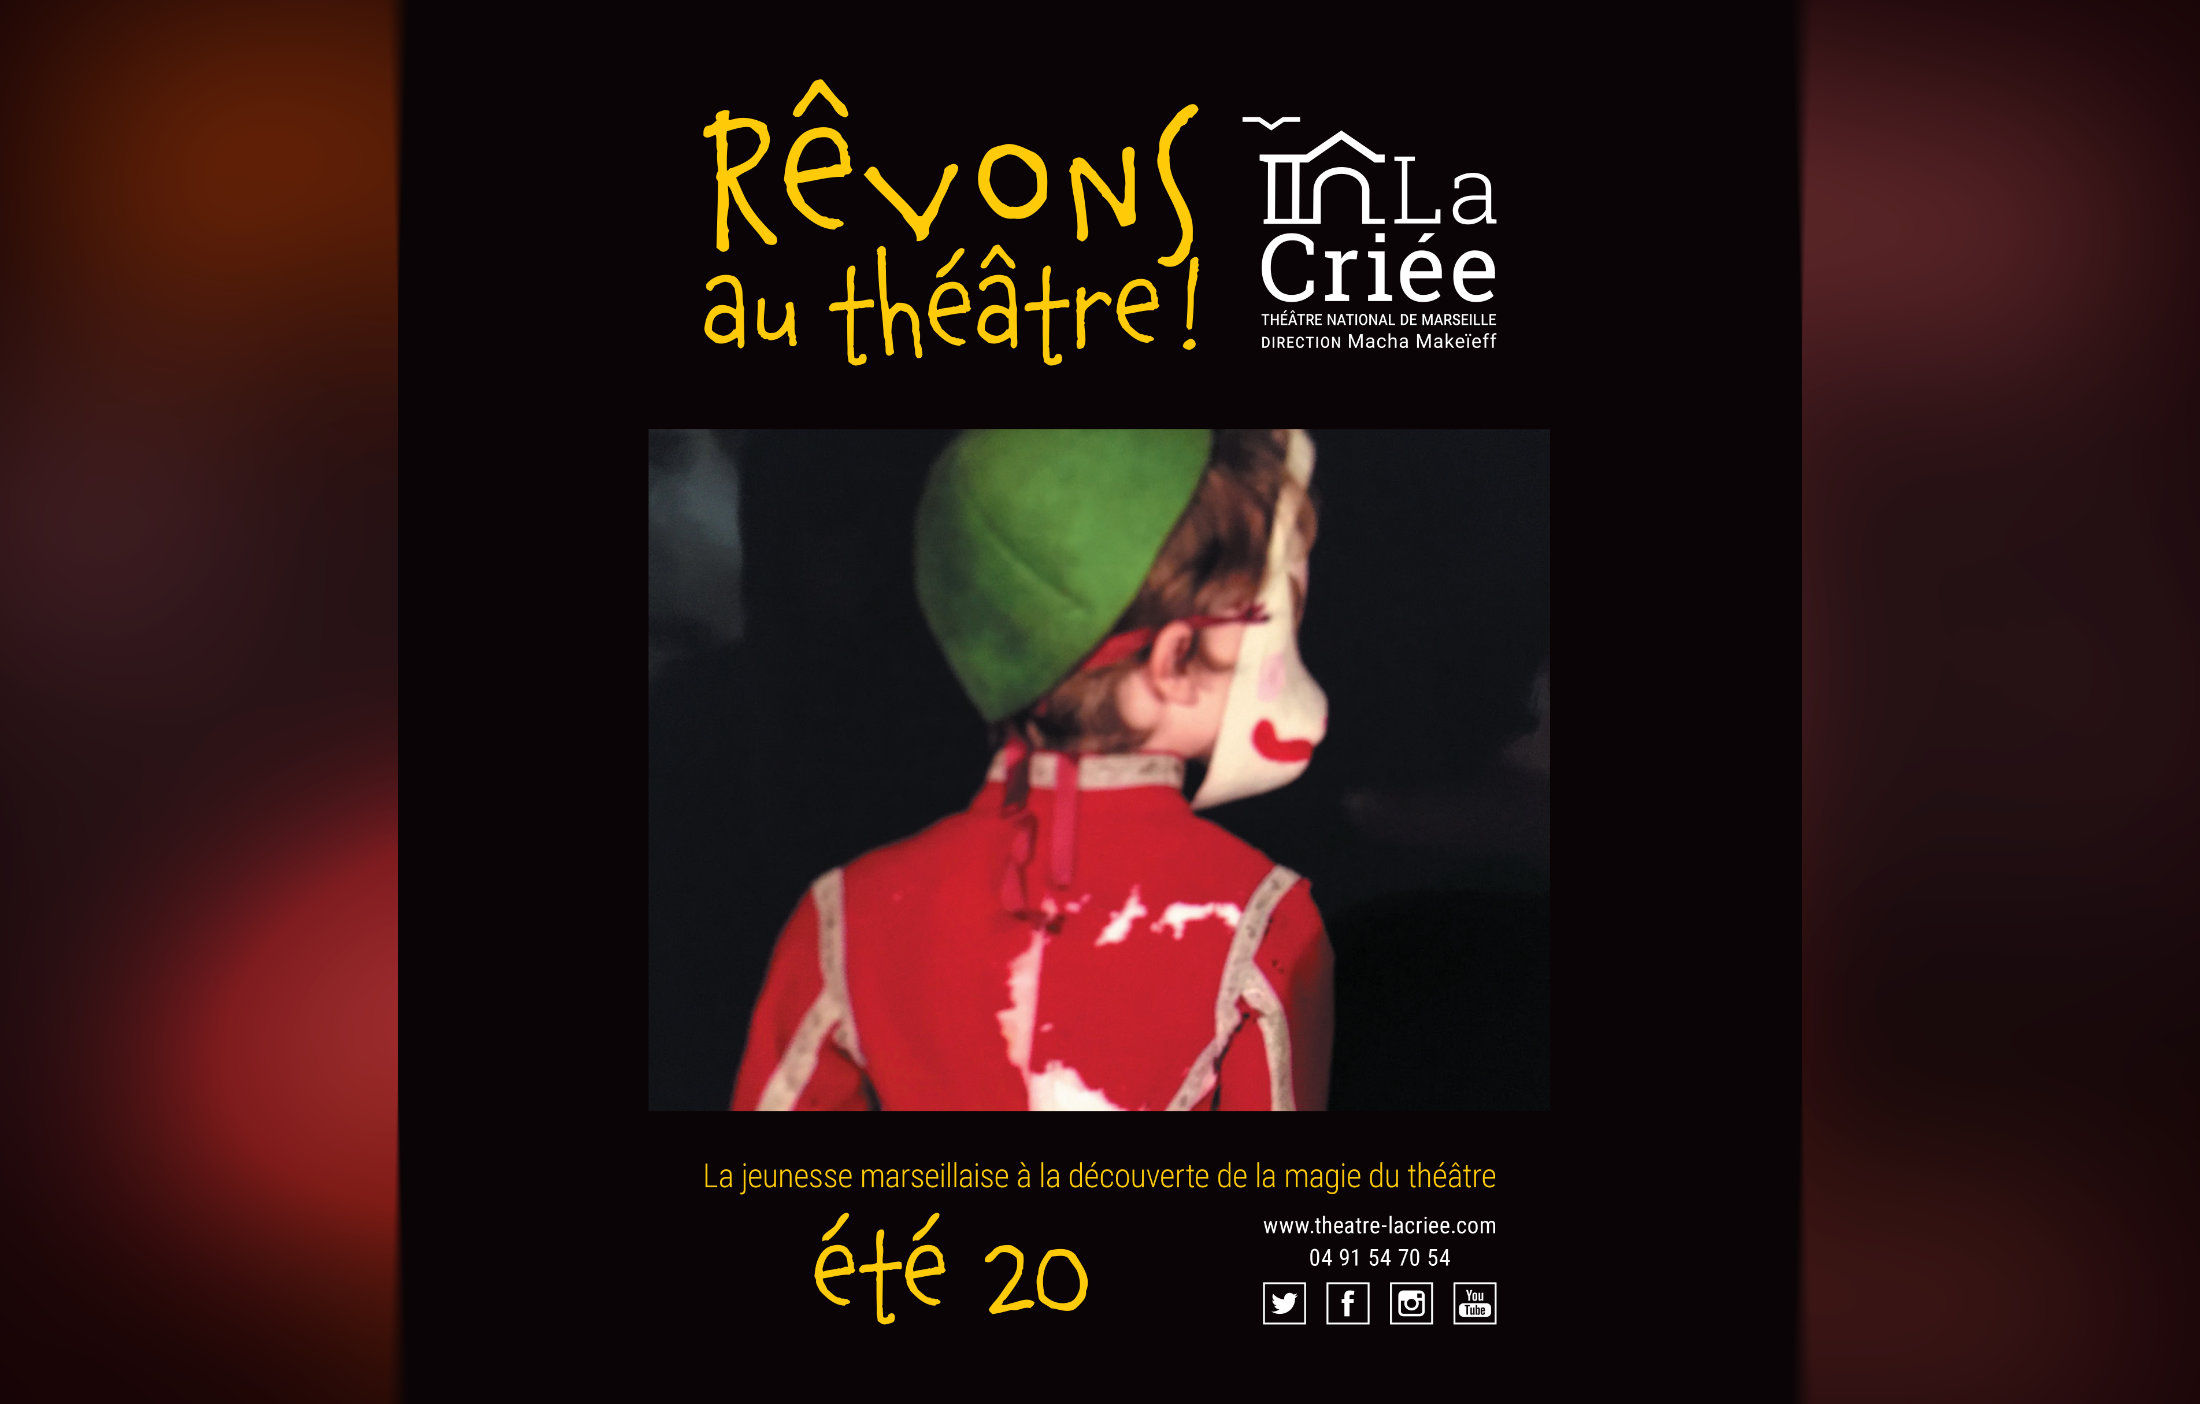 Revons-au-theatre-Ete-2020@2x